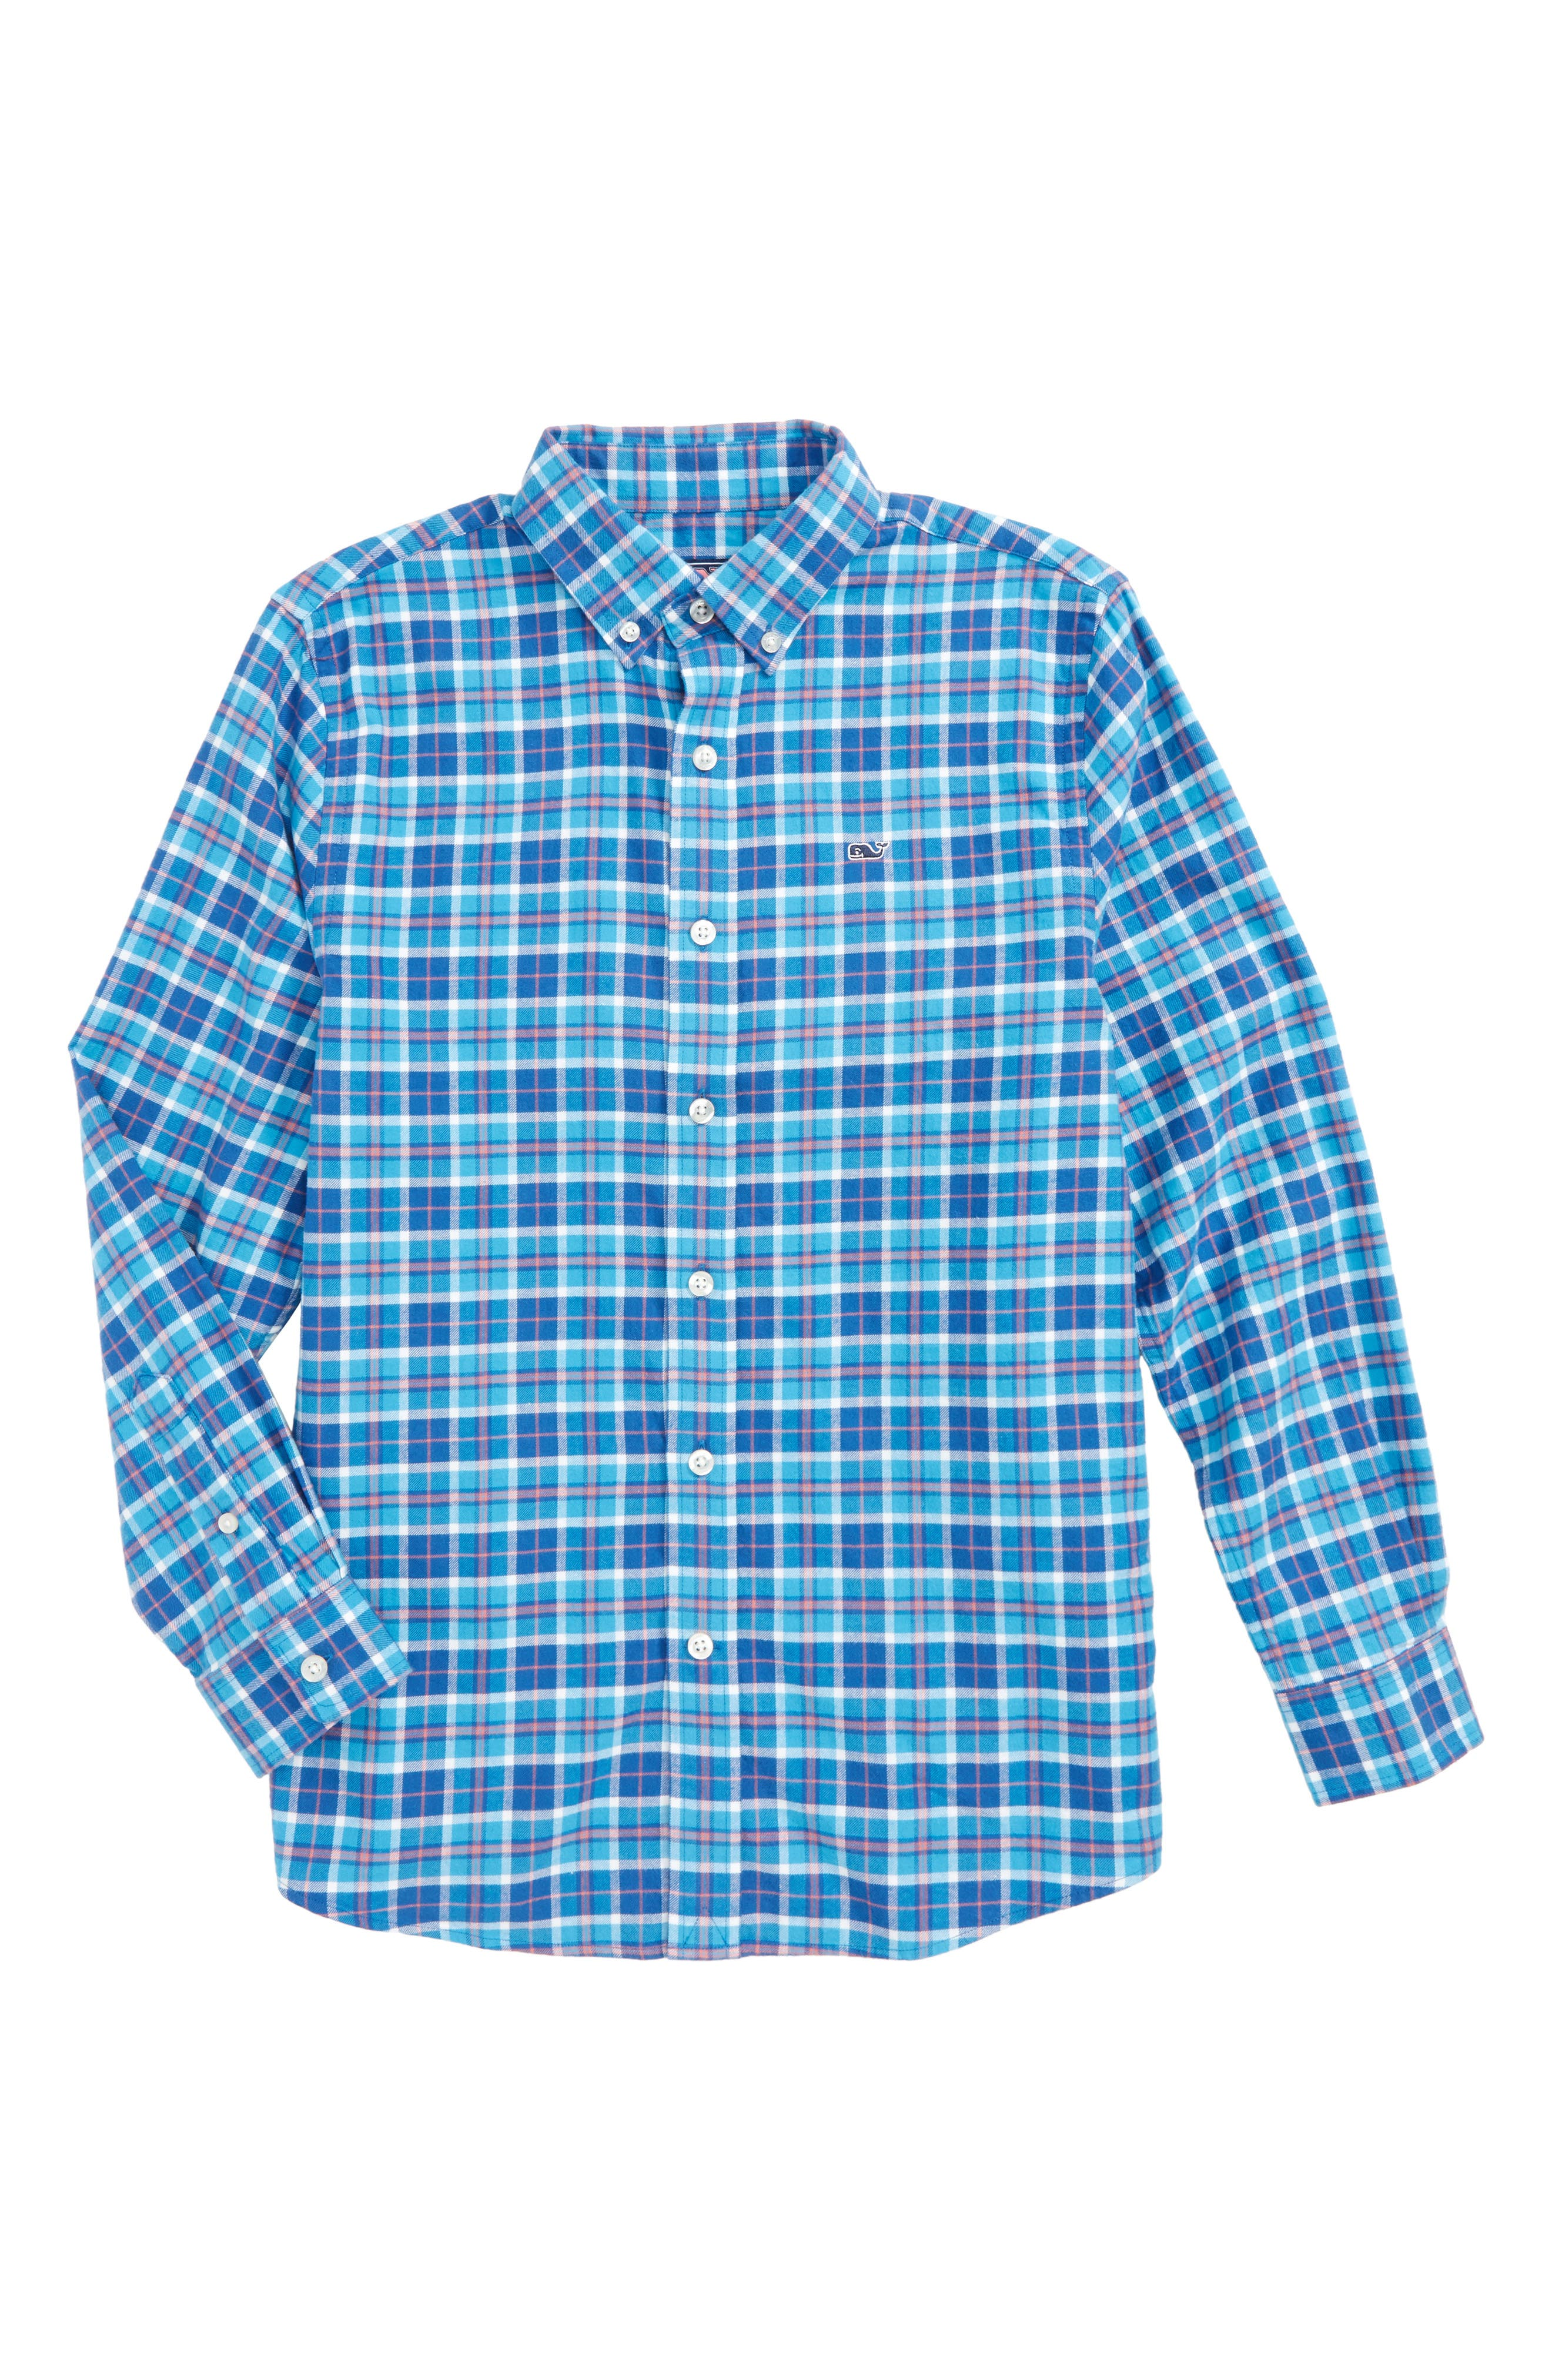 Plaskett Creek Plaid Whale Shirt,                         Main,                         color, Atlantic Blue